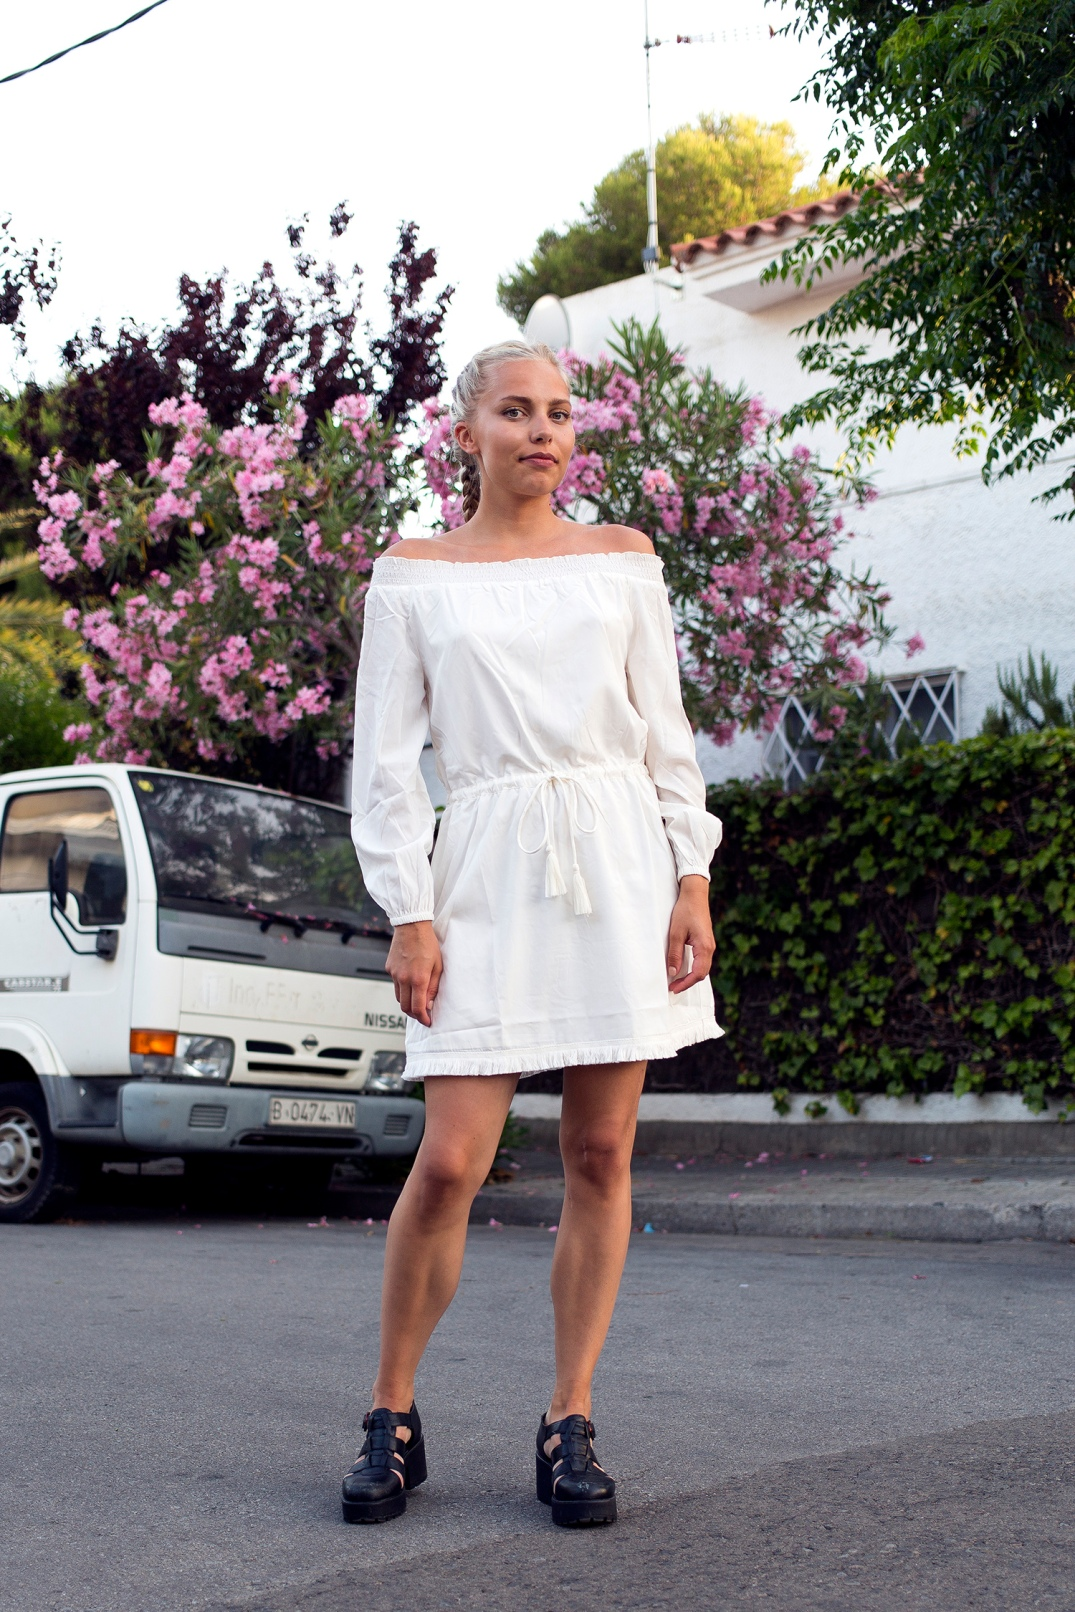 dress_RKS_20160624-CB6A9727